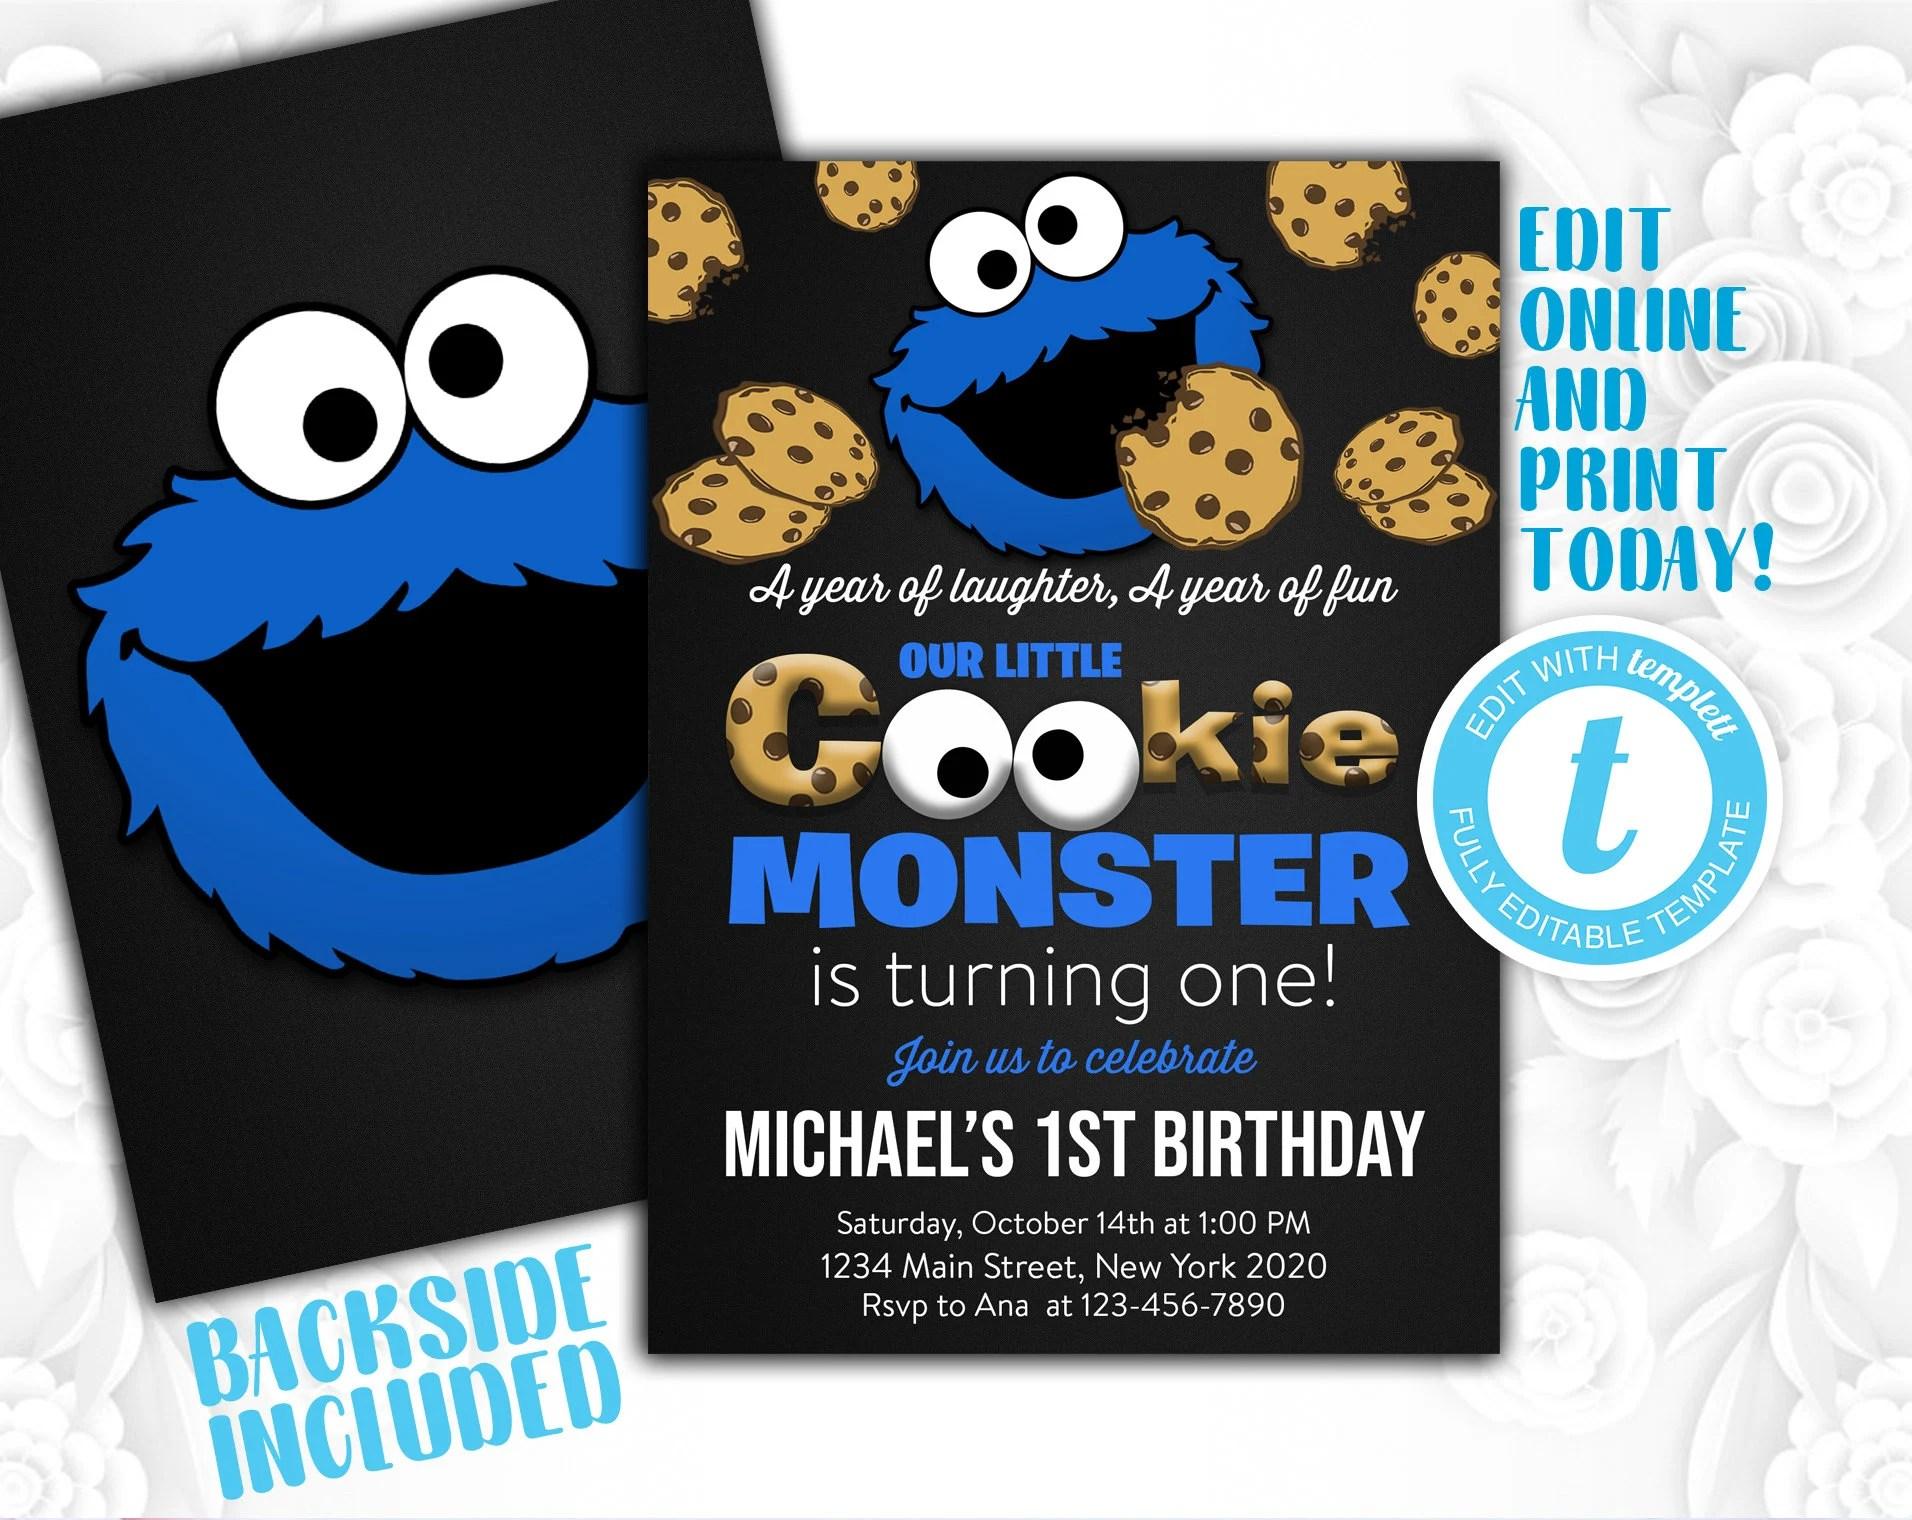 cookie monster invitation cookie monster birthday cookie monster invite cookie monster party cookie monster pdf cookie monster edit